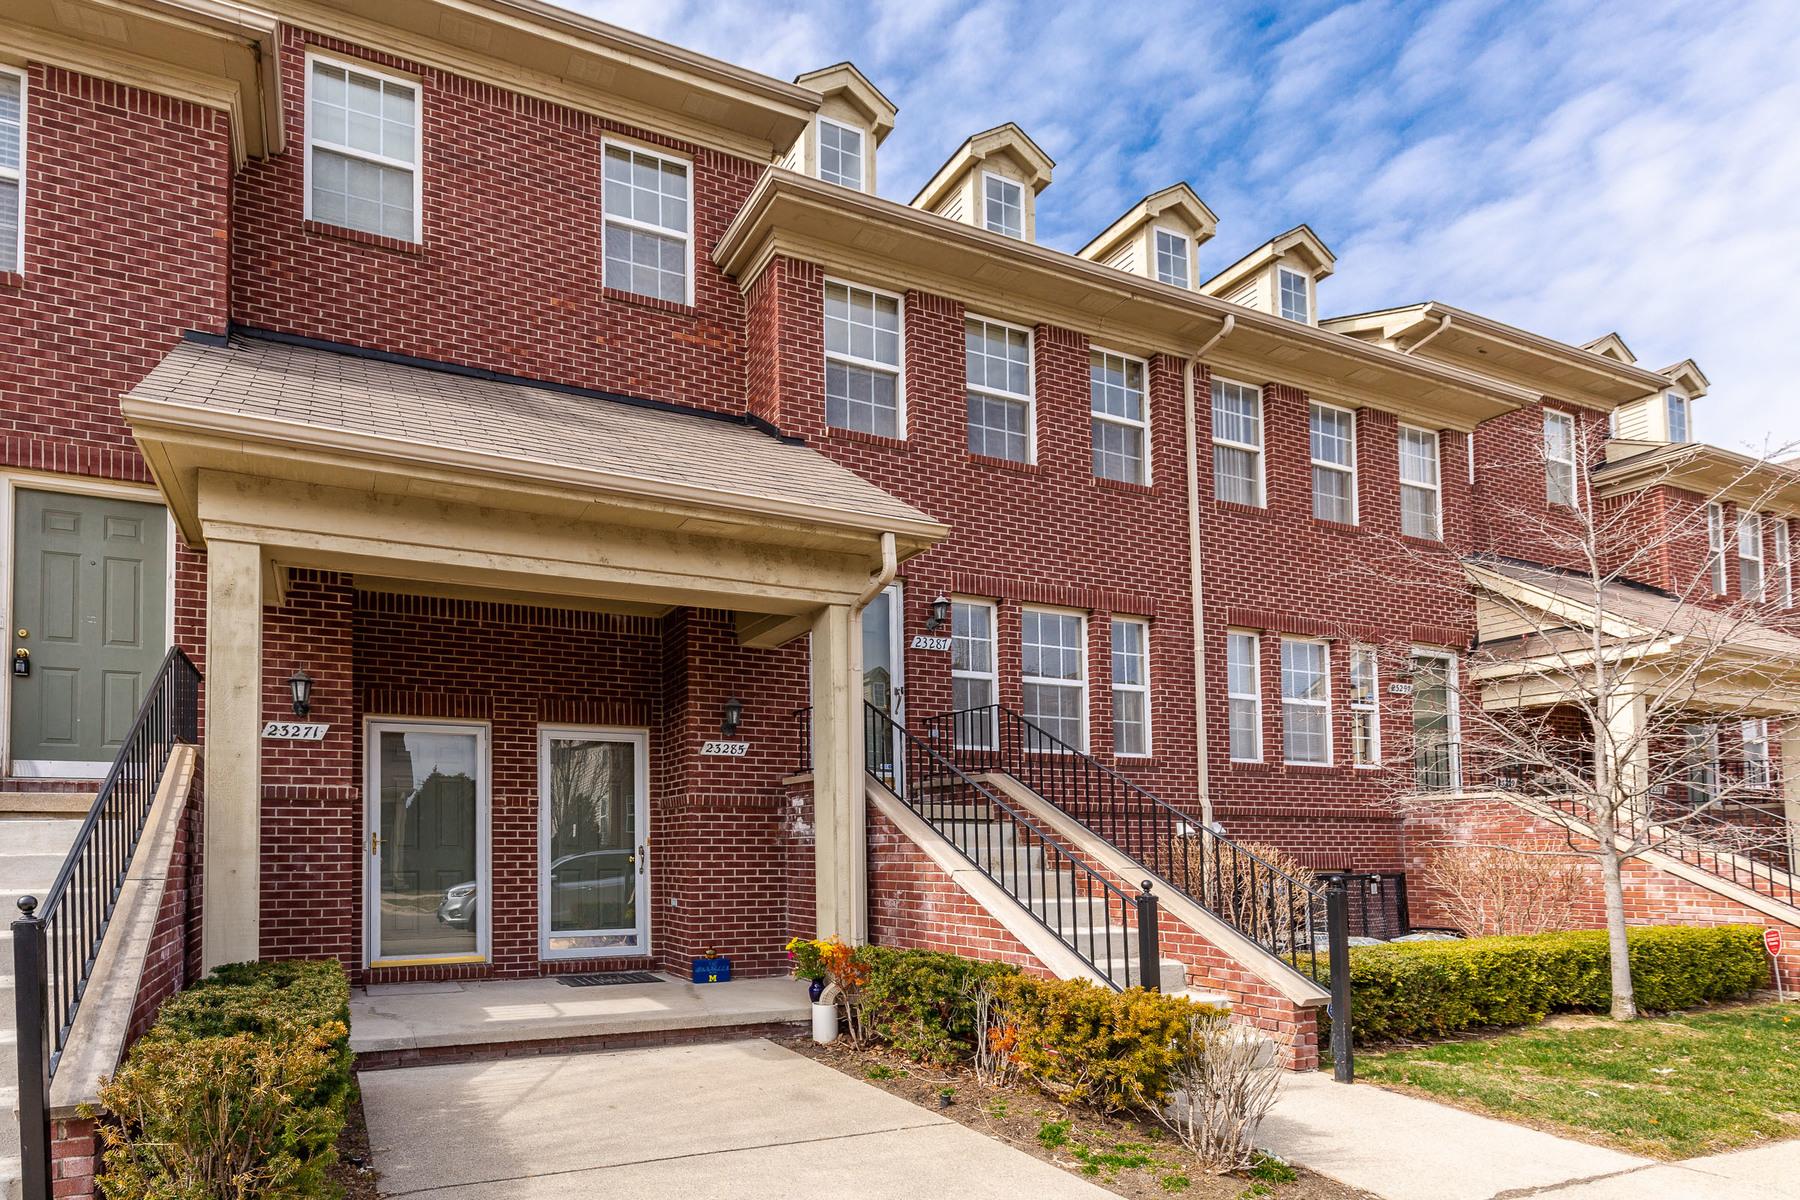 townhouses para Venda às Sotuthfield 23285 Grayson Drive, Southfield, Michigan 48075 Estados Unidos